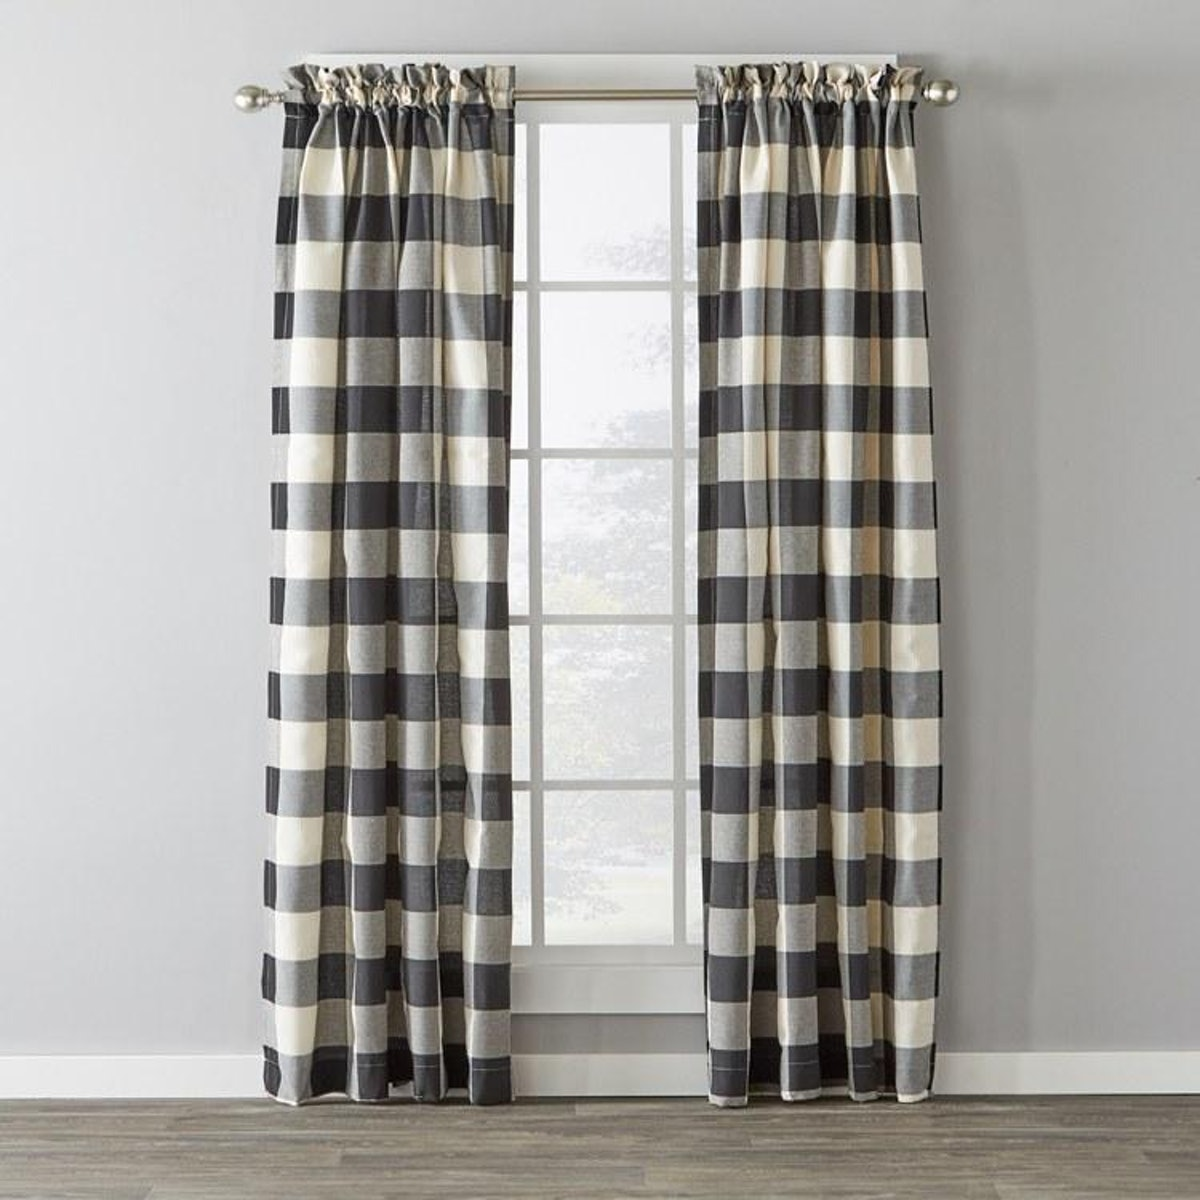 Black Grandin Curtains